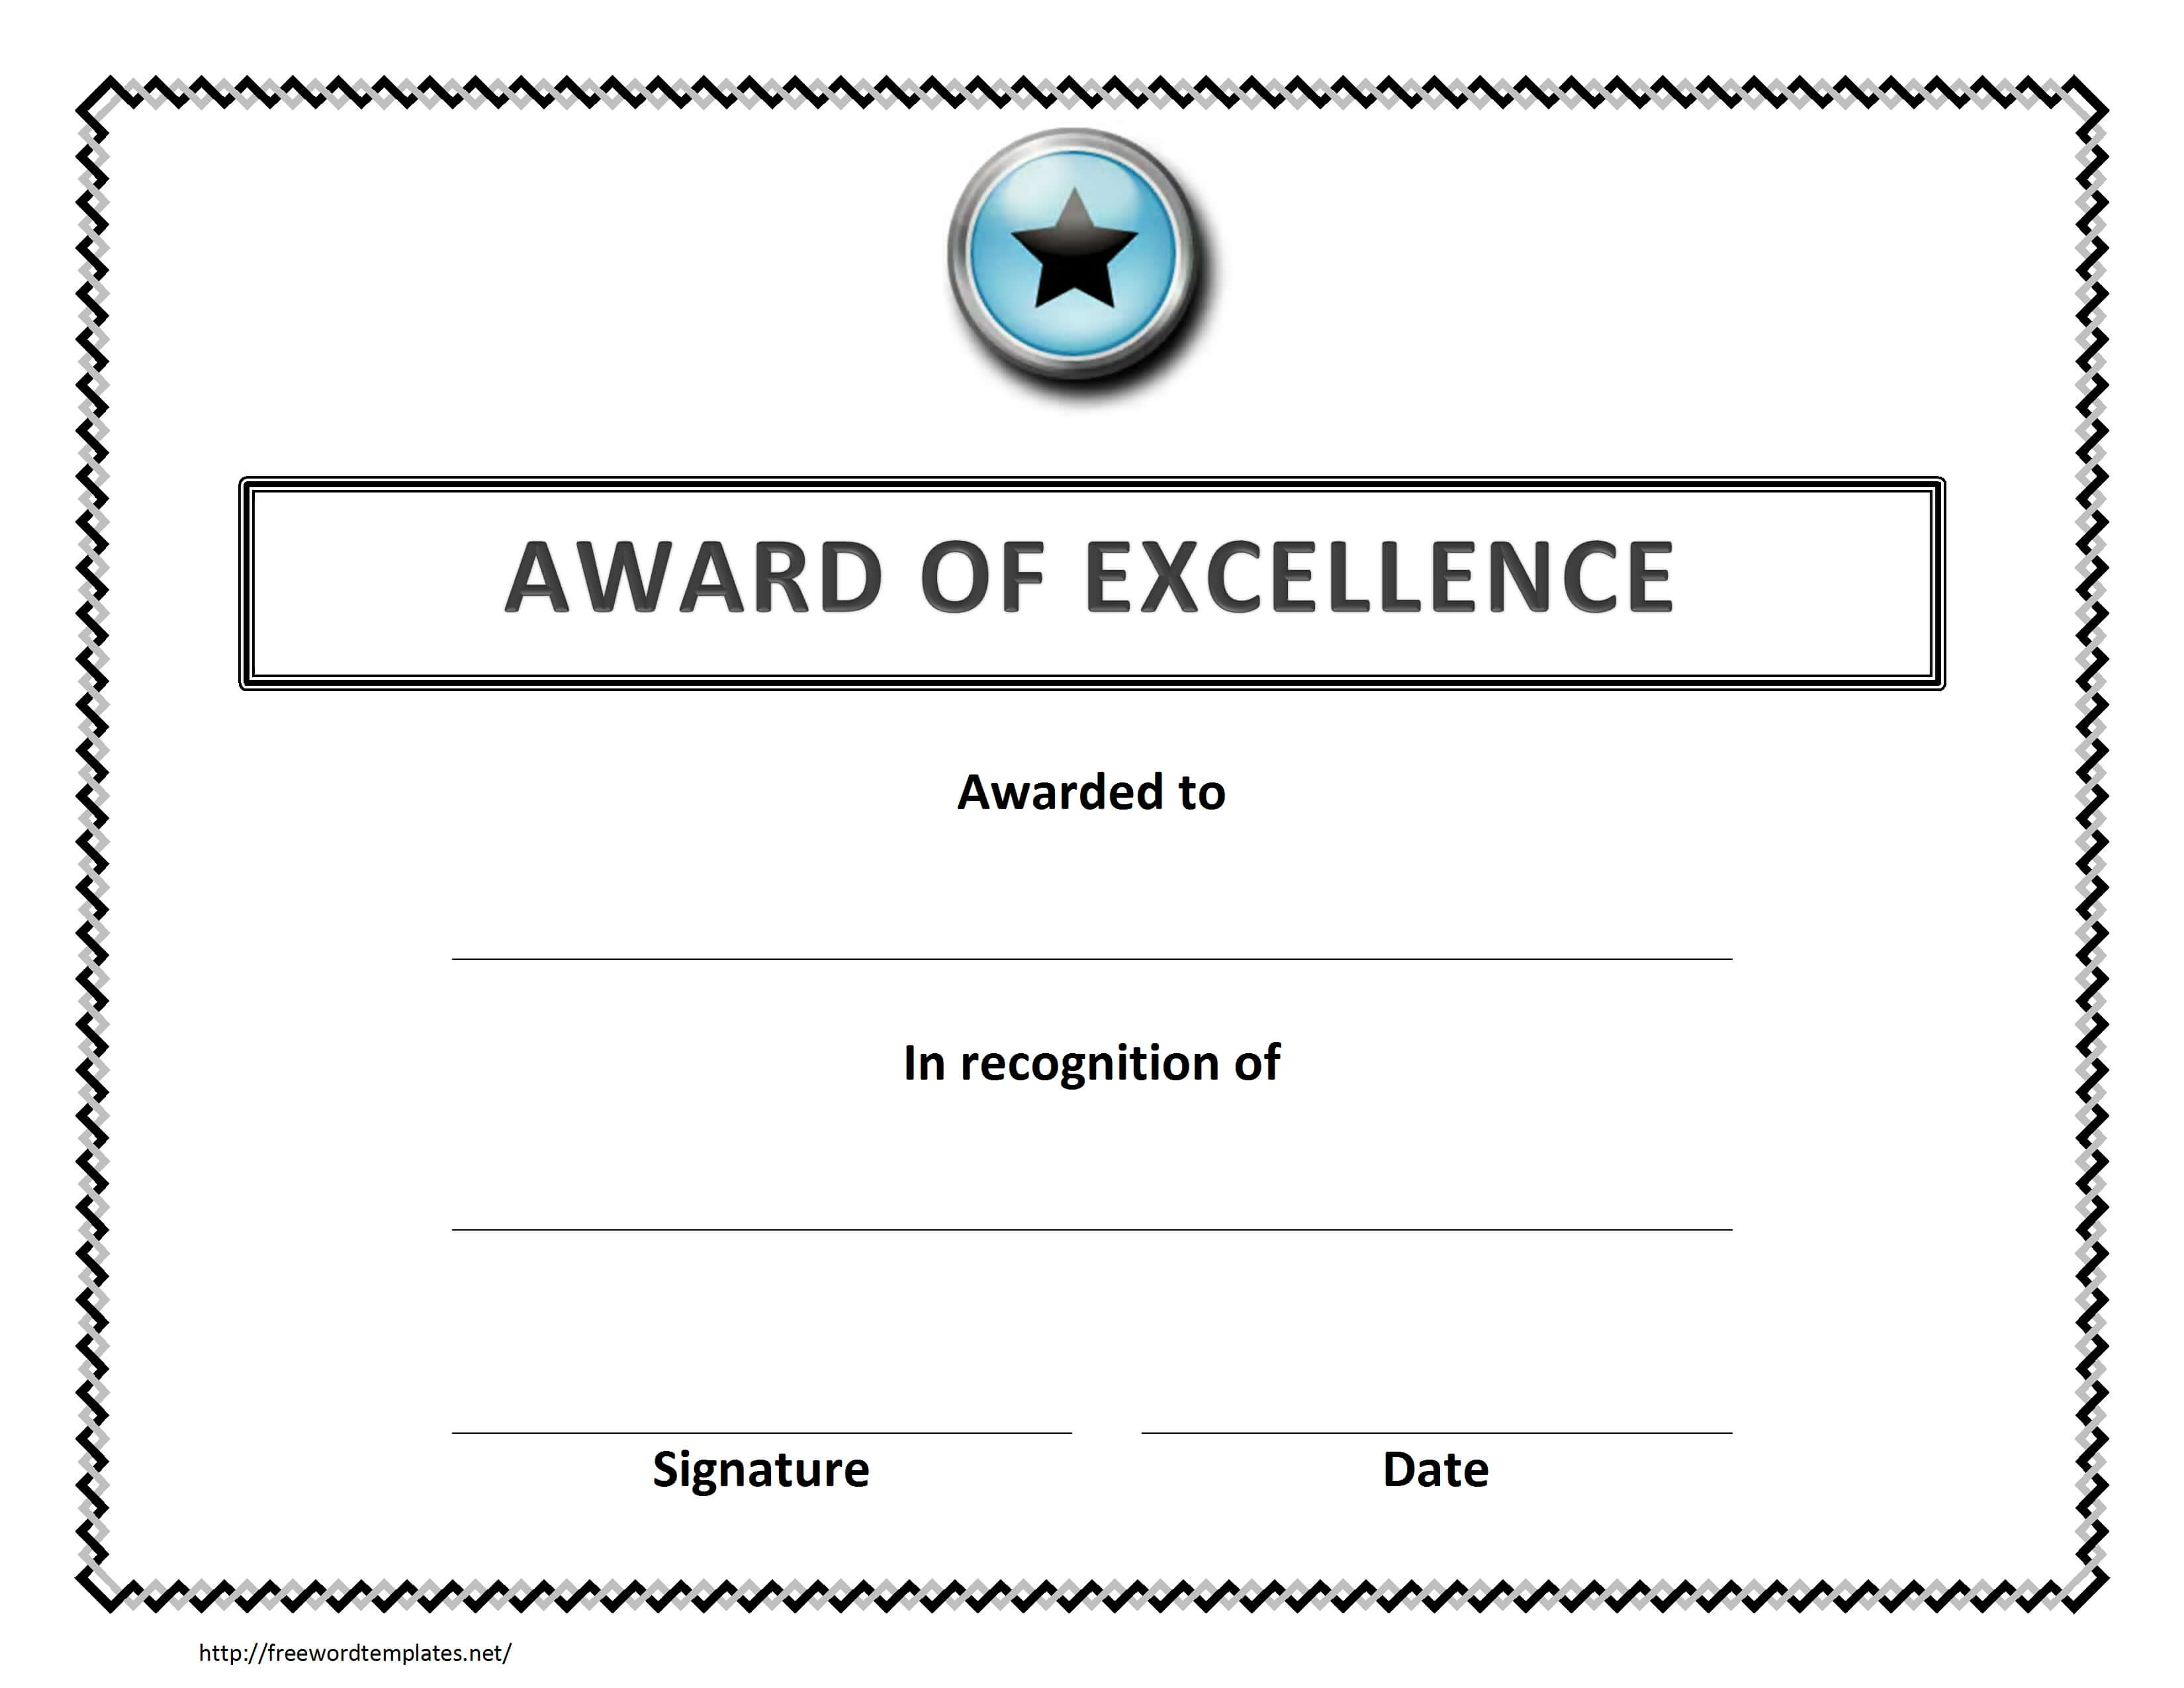 012 Microsoft Word Certificate Template Ideas Free Awesome within Award Certificate Templates Word 2007